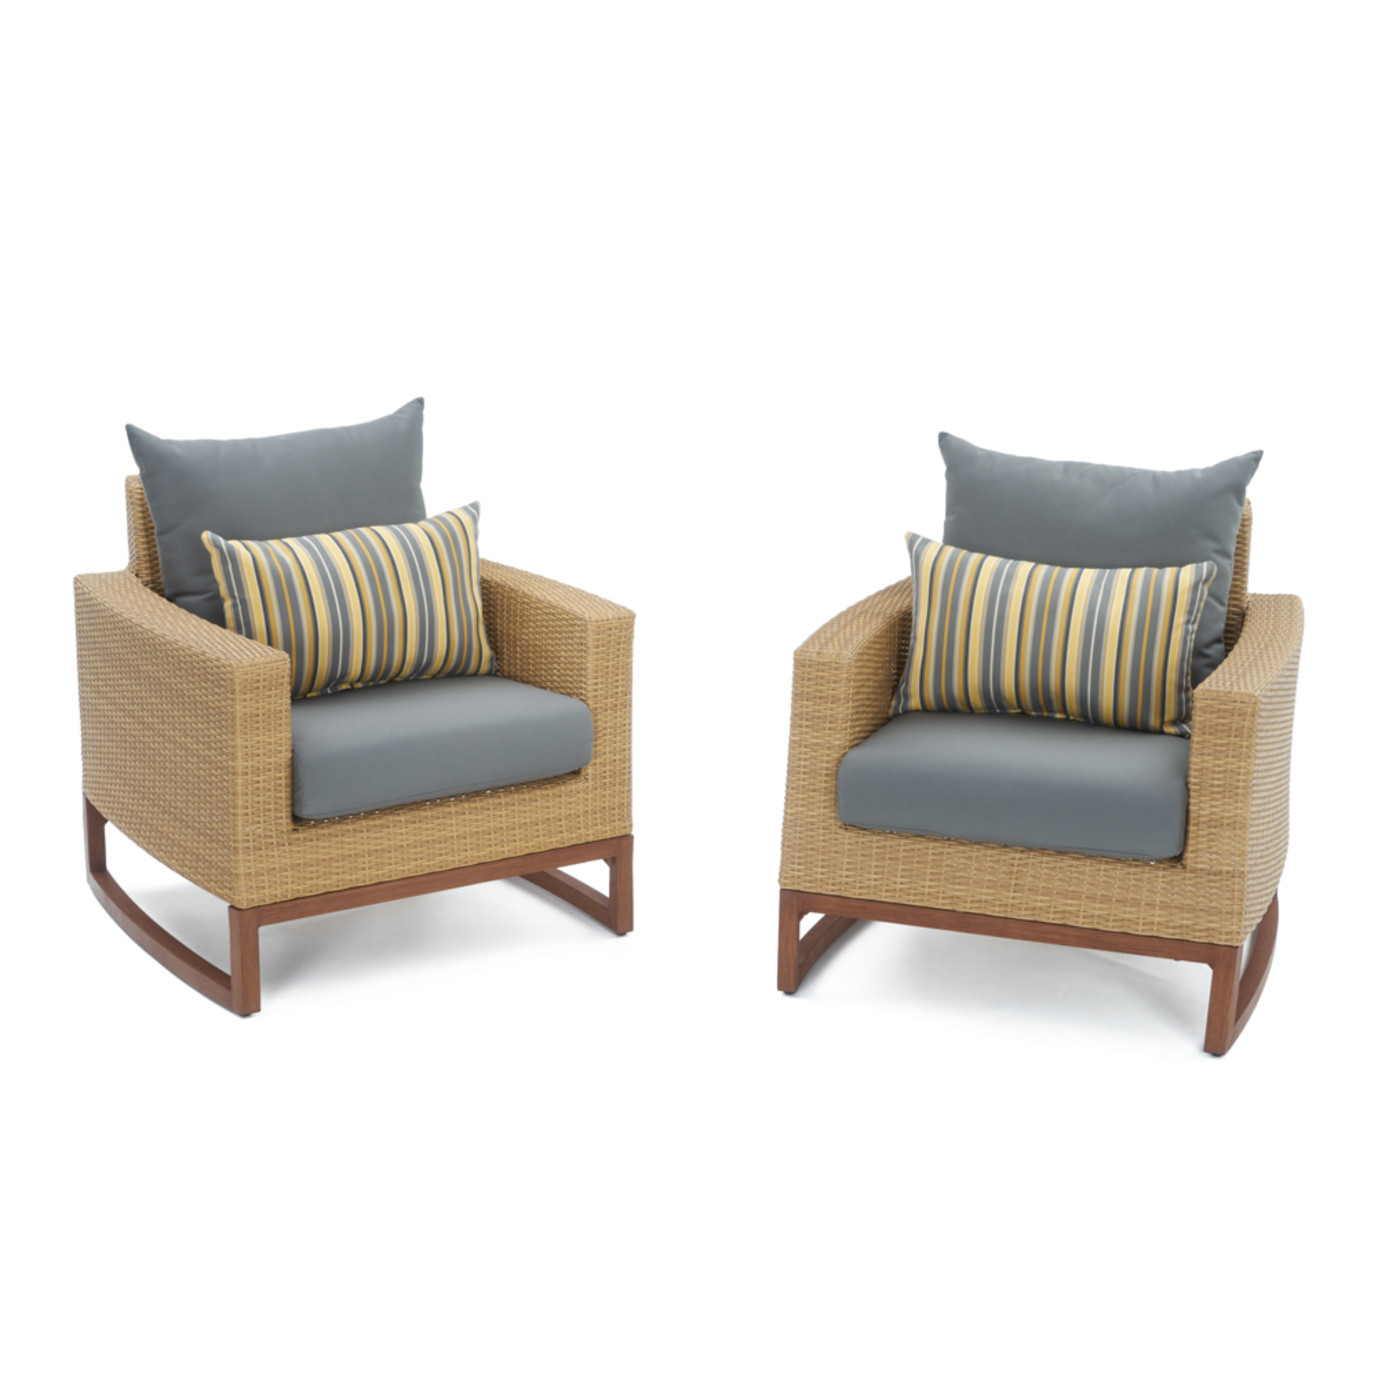 Mili™ 4pc Seating Set - Charcoal Gray